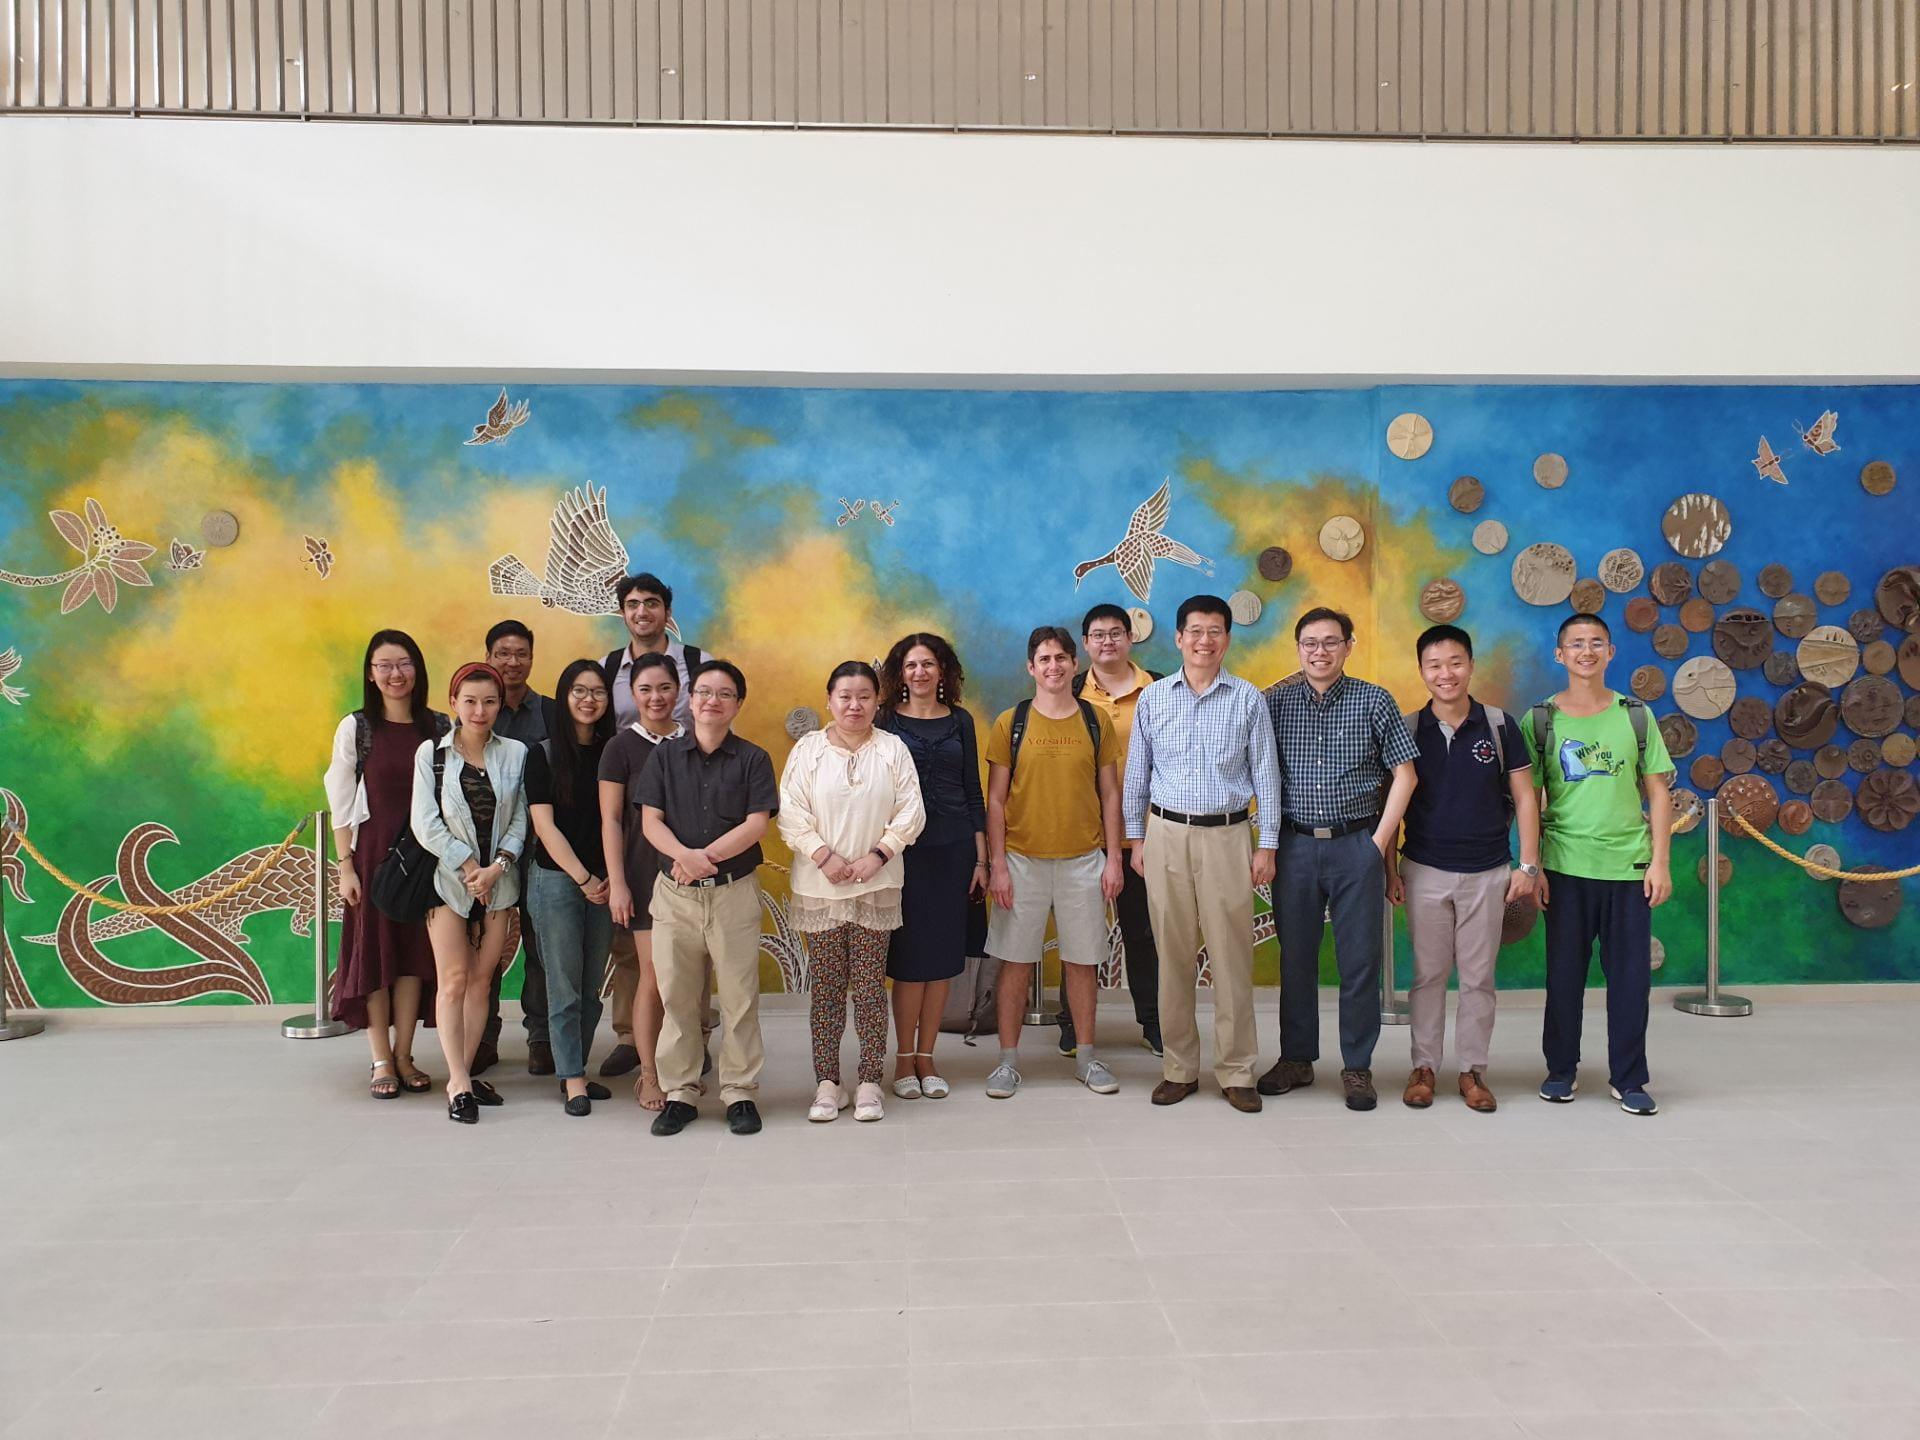 Singapore-Hong Kong-Macau Symposium on Chinese Philosophy